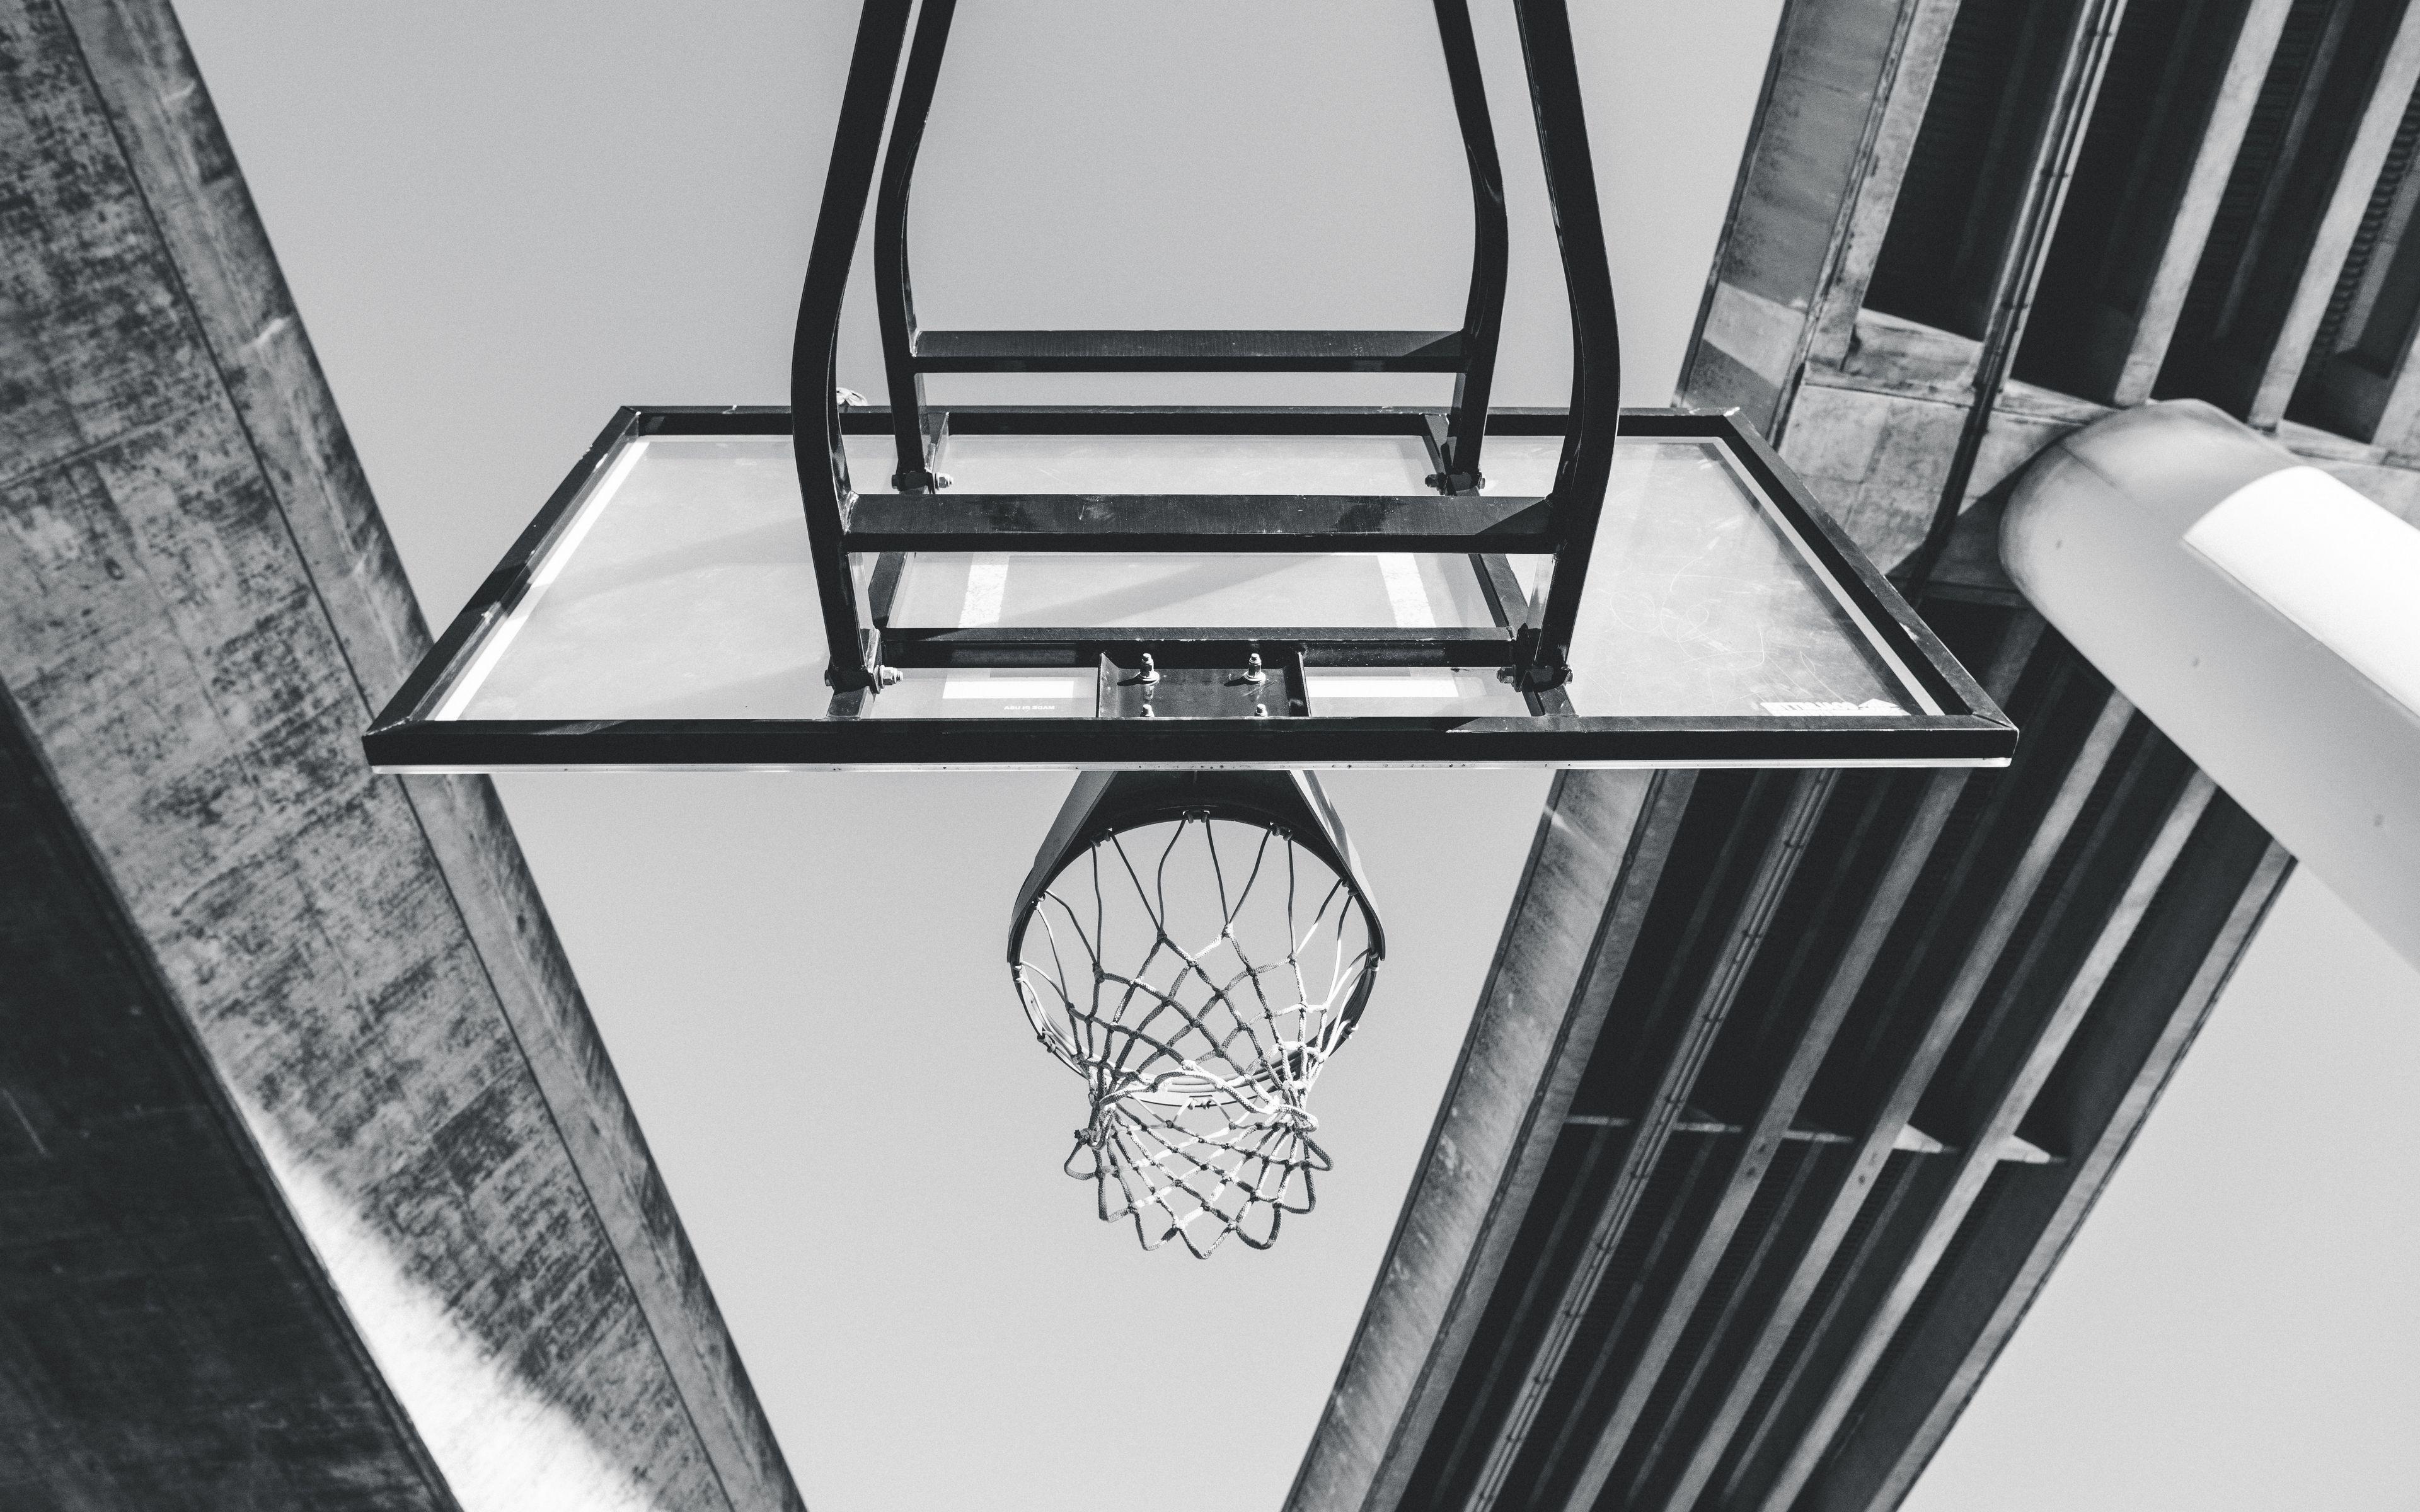 3840x2400 Wallpaper basketball, ring, mesh, bw